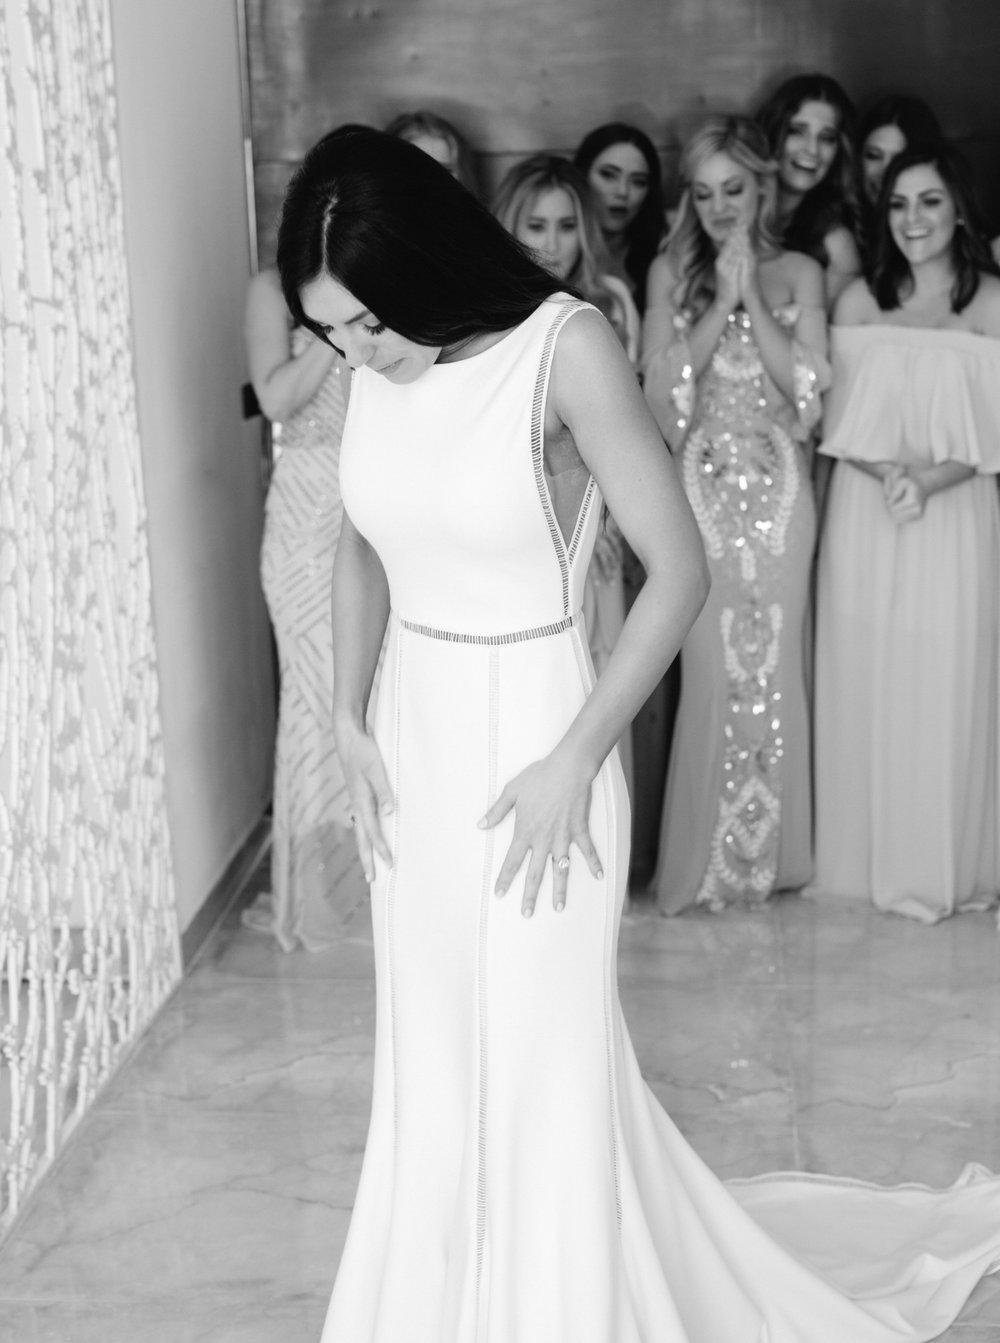 Kyle John l Fine Art Wedding Photography l Chicago, Copenhagen, California, New York, Destination l Blog l Brooke Boyd_The Film Poets_Tulum Wedding_3